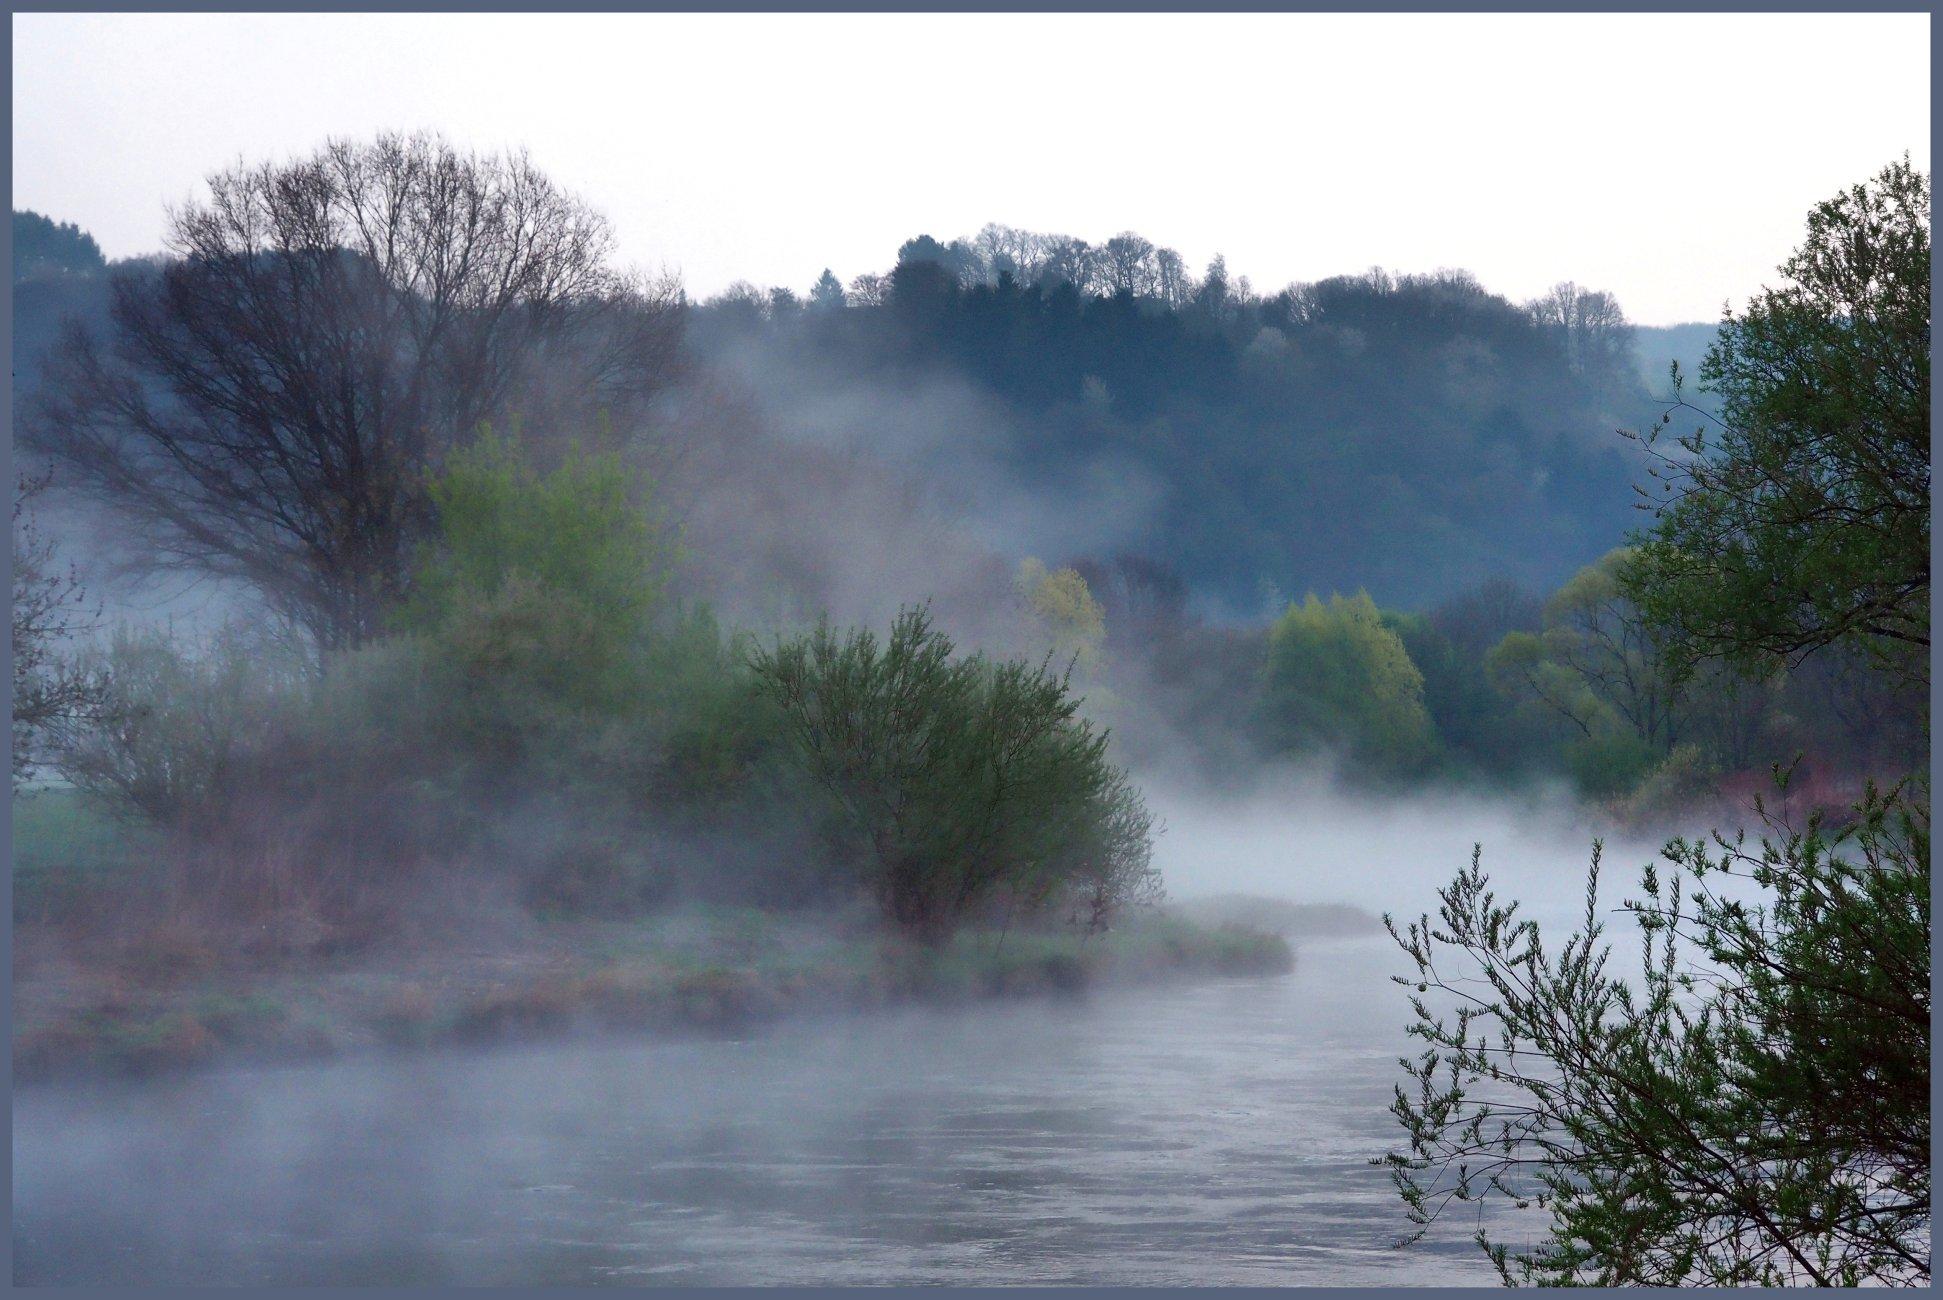 Morning At The River